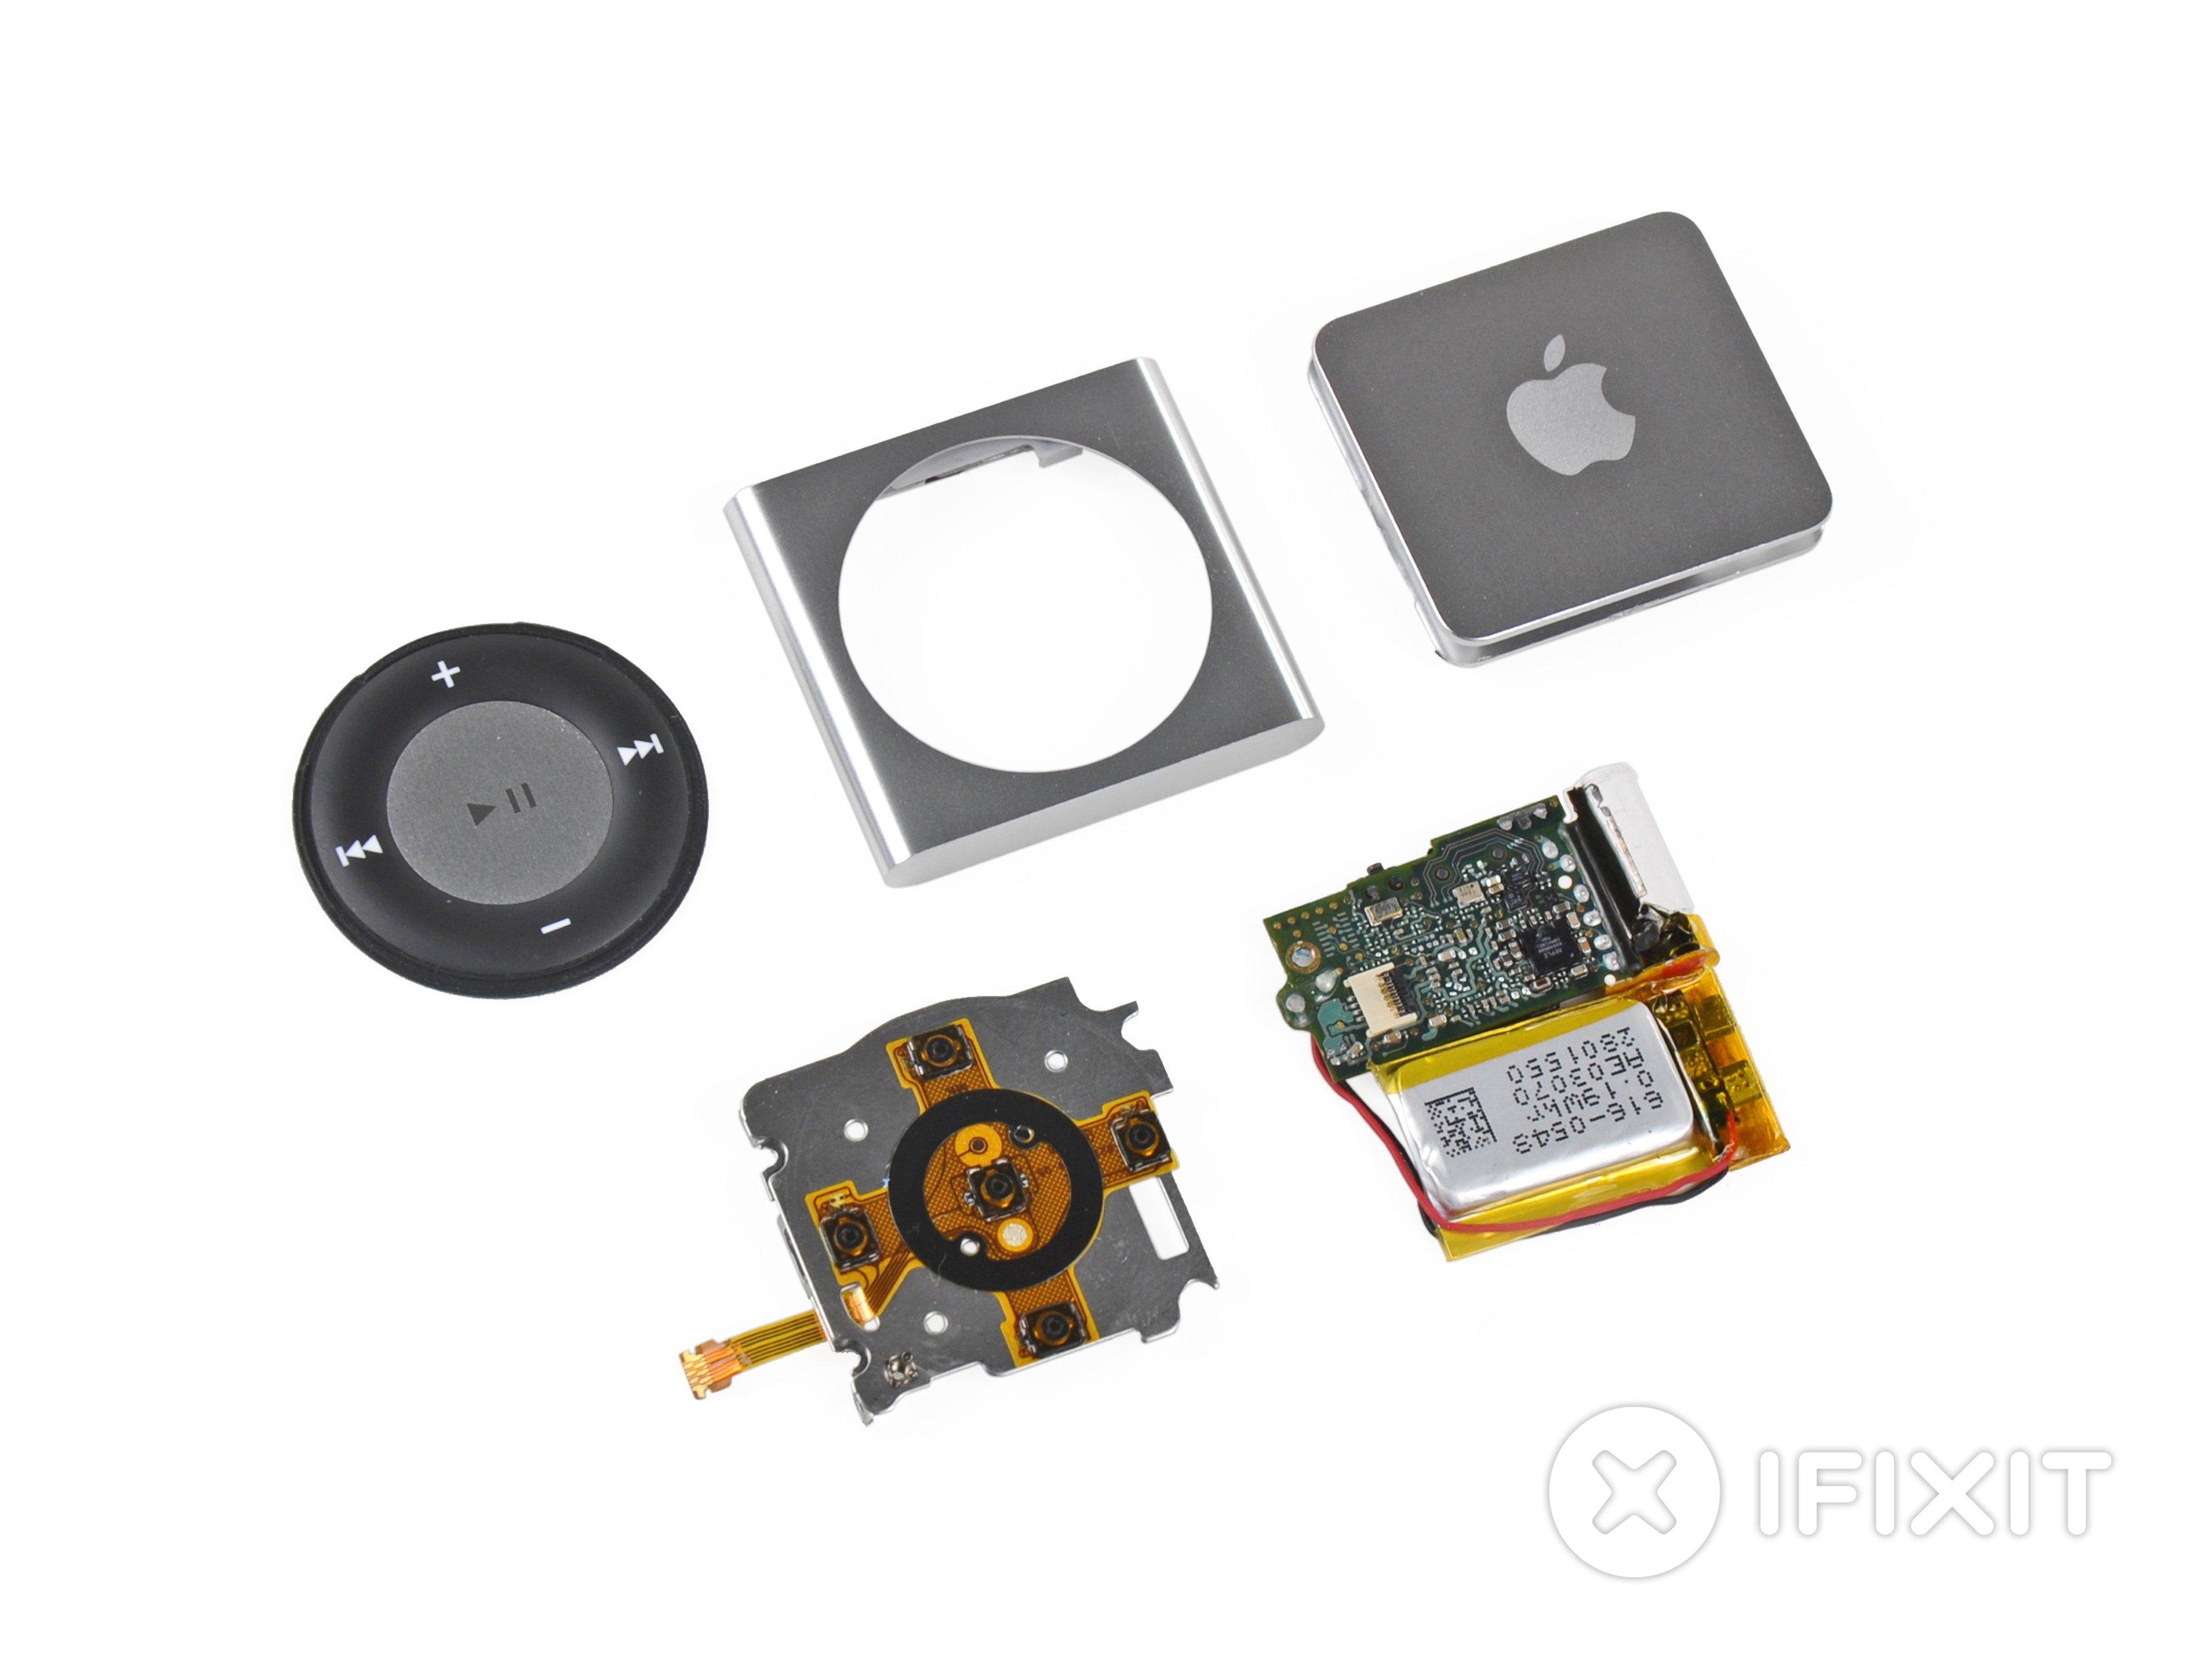 iPod Shuffle 4th Generation Teardown